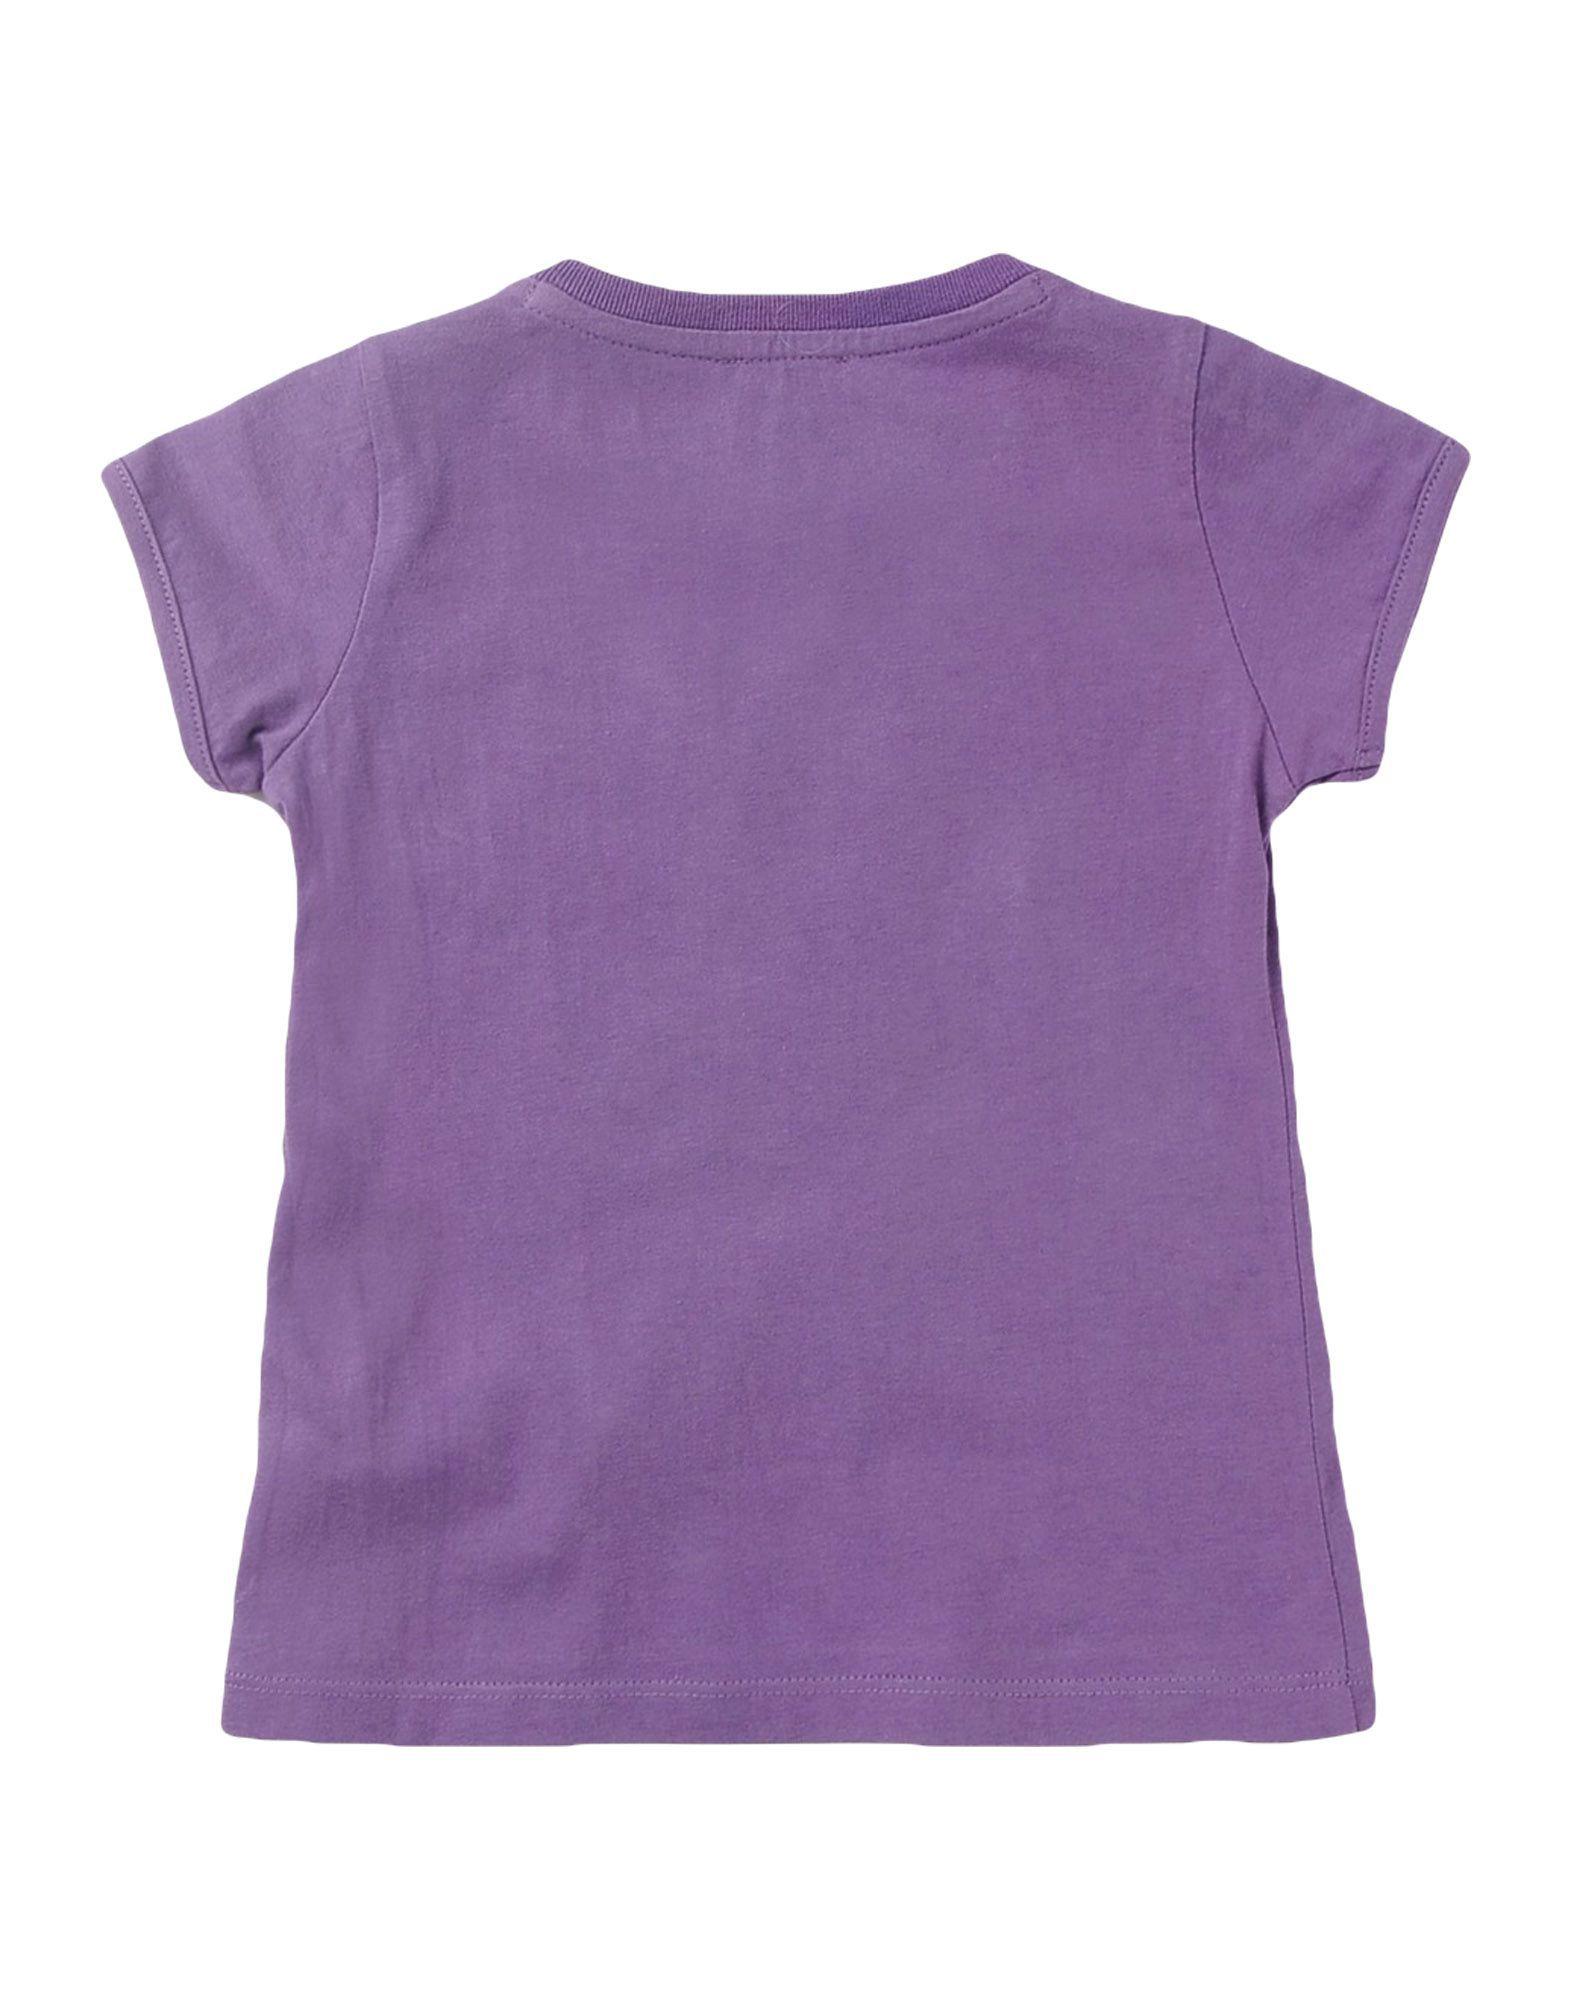 Armani Junior Purple Girl Cotton T-Shirt